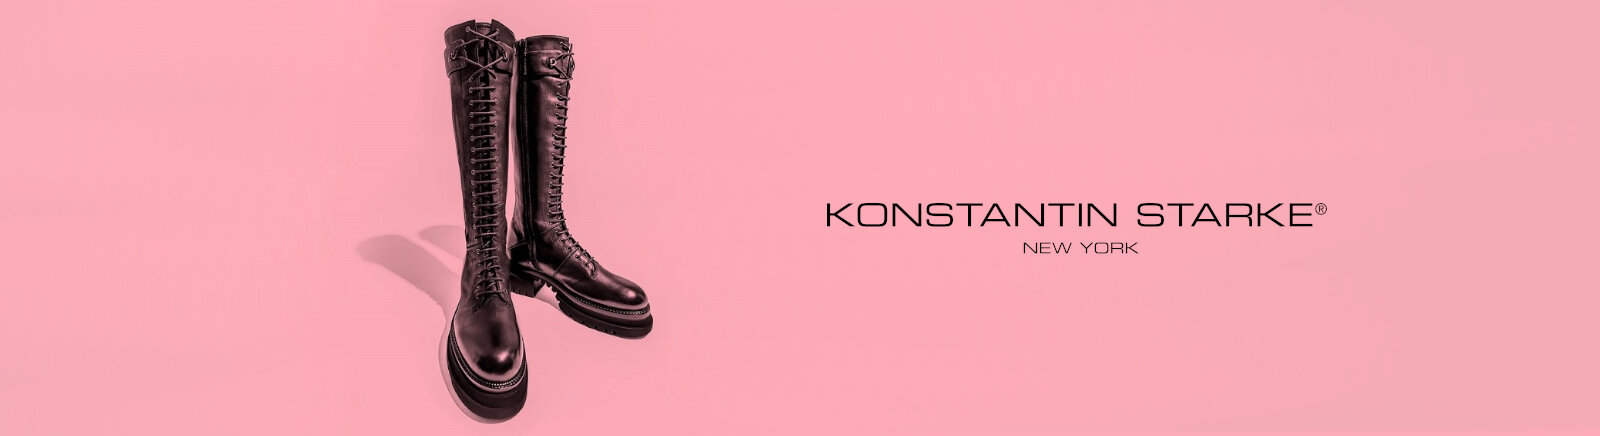 Gisy: Konstantin Starke Abendschuhe für Damen online shoppen